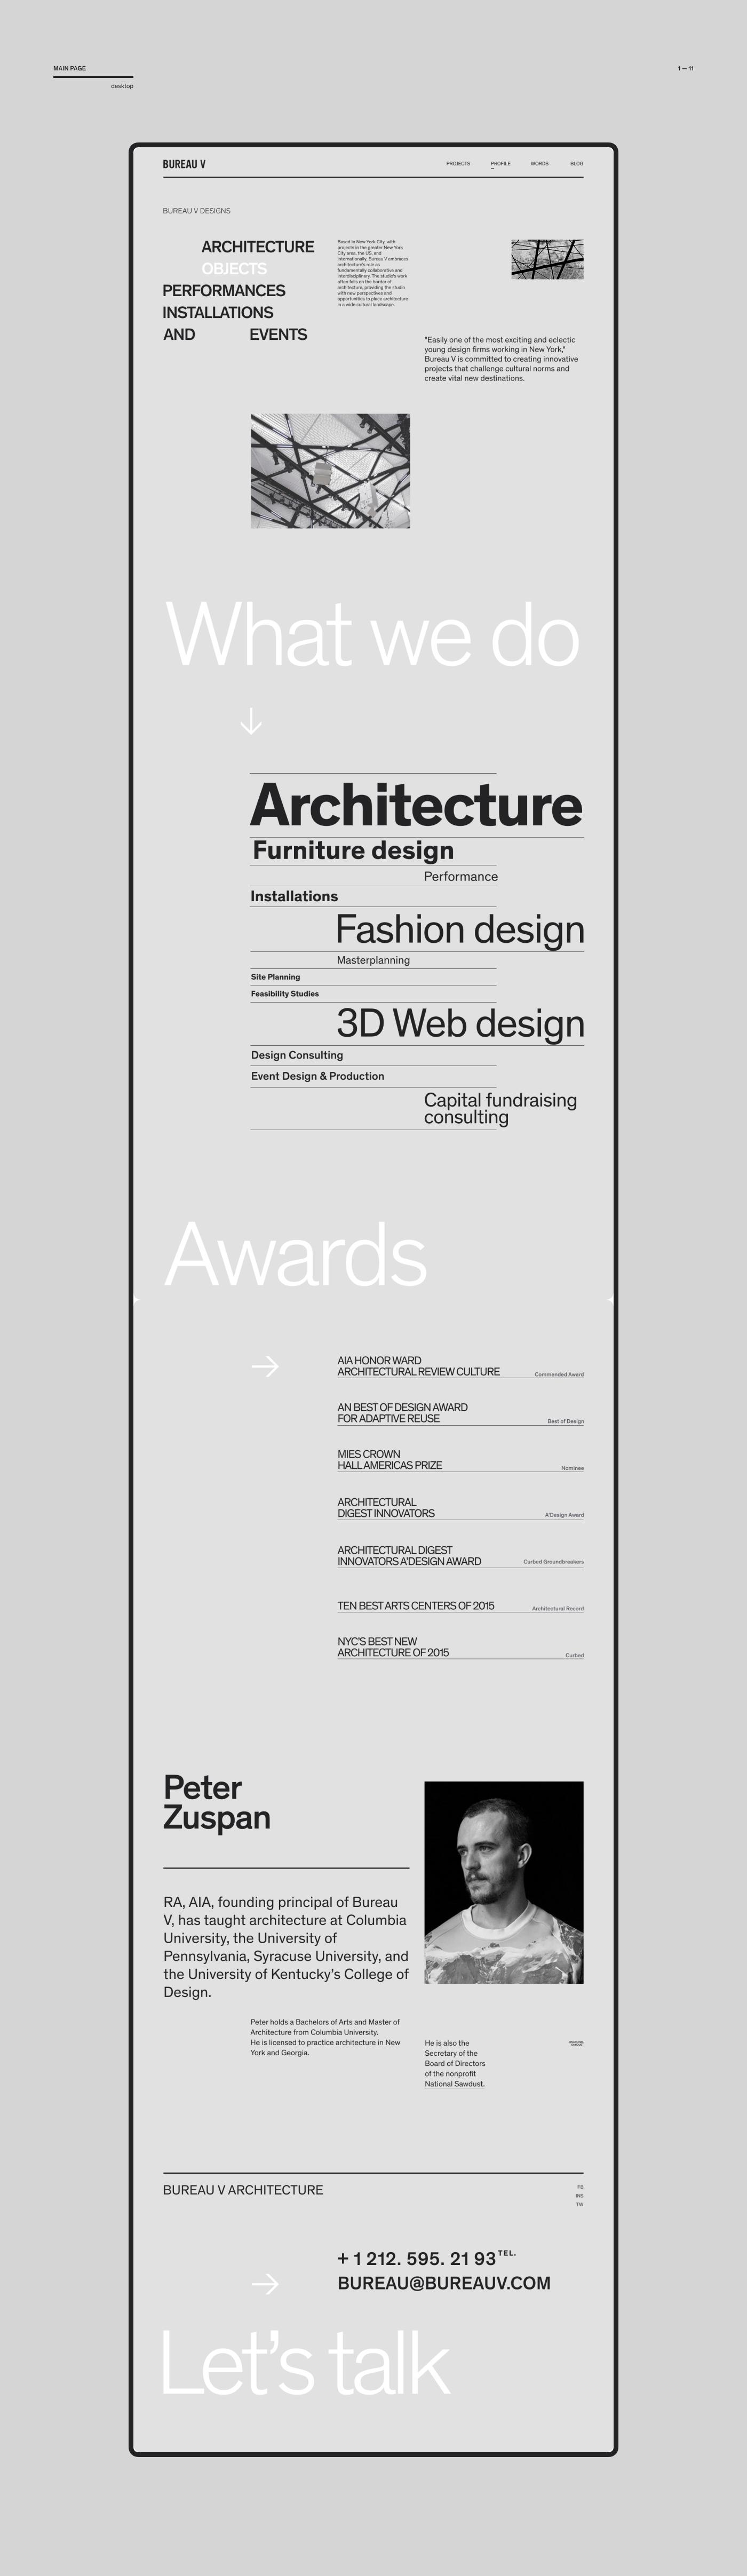 Сайт архитектурного бюро. Дизайн концепция